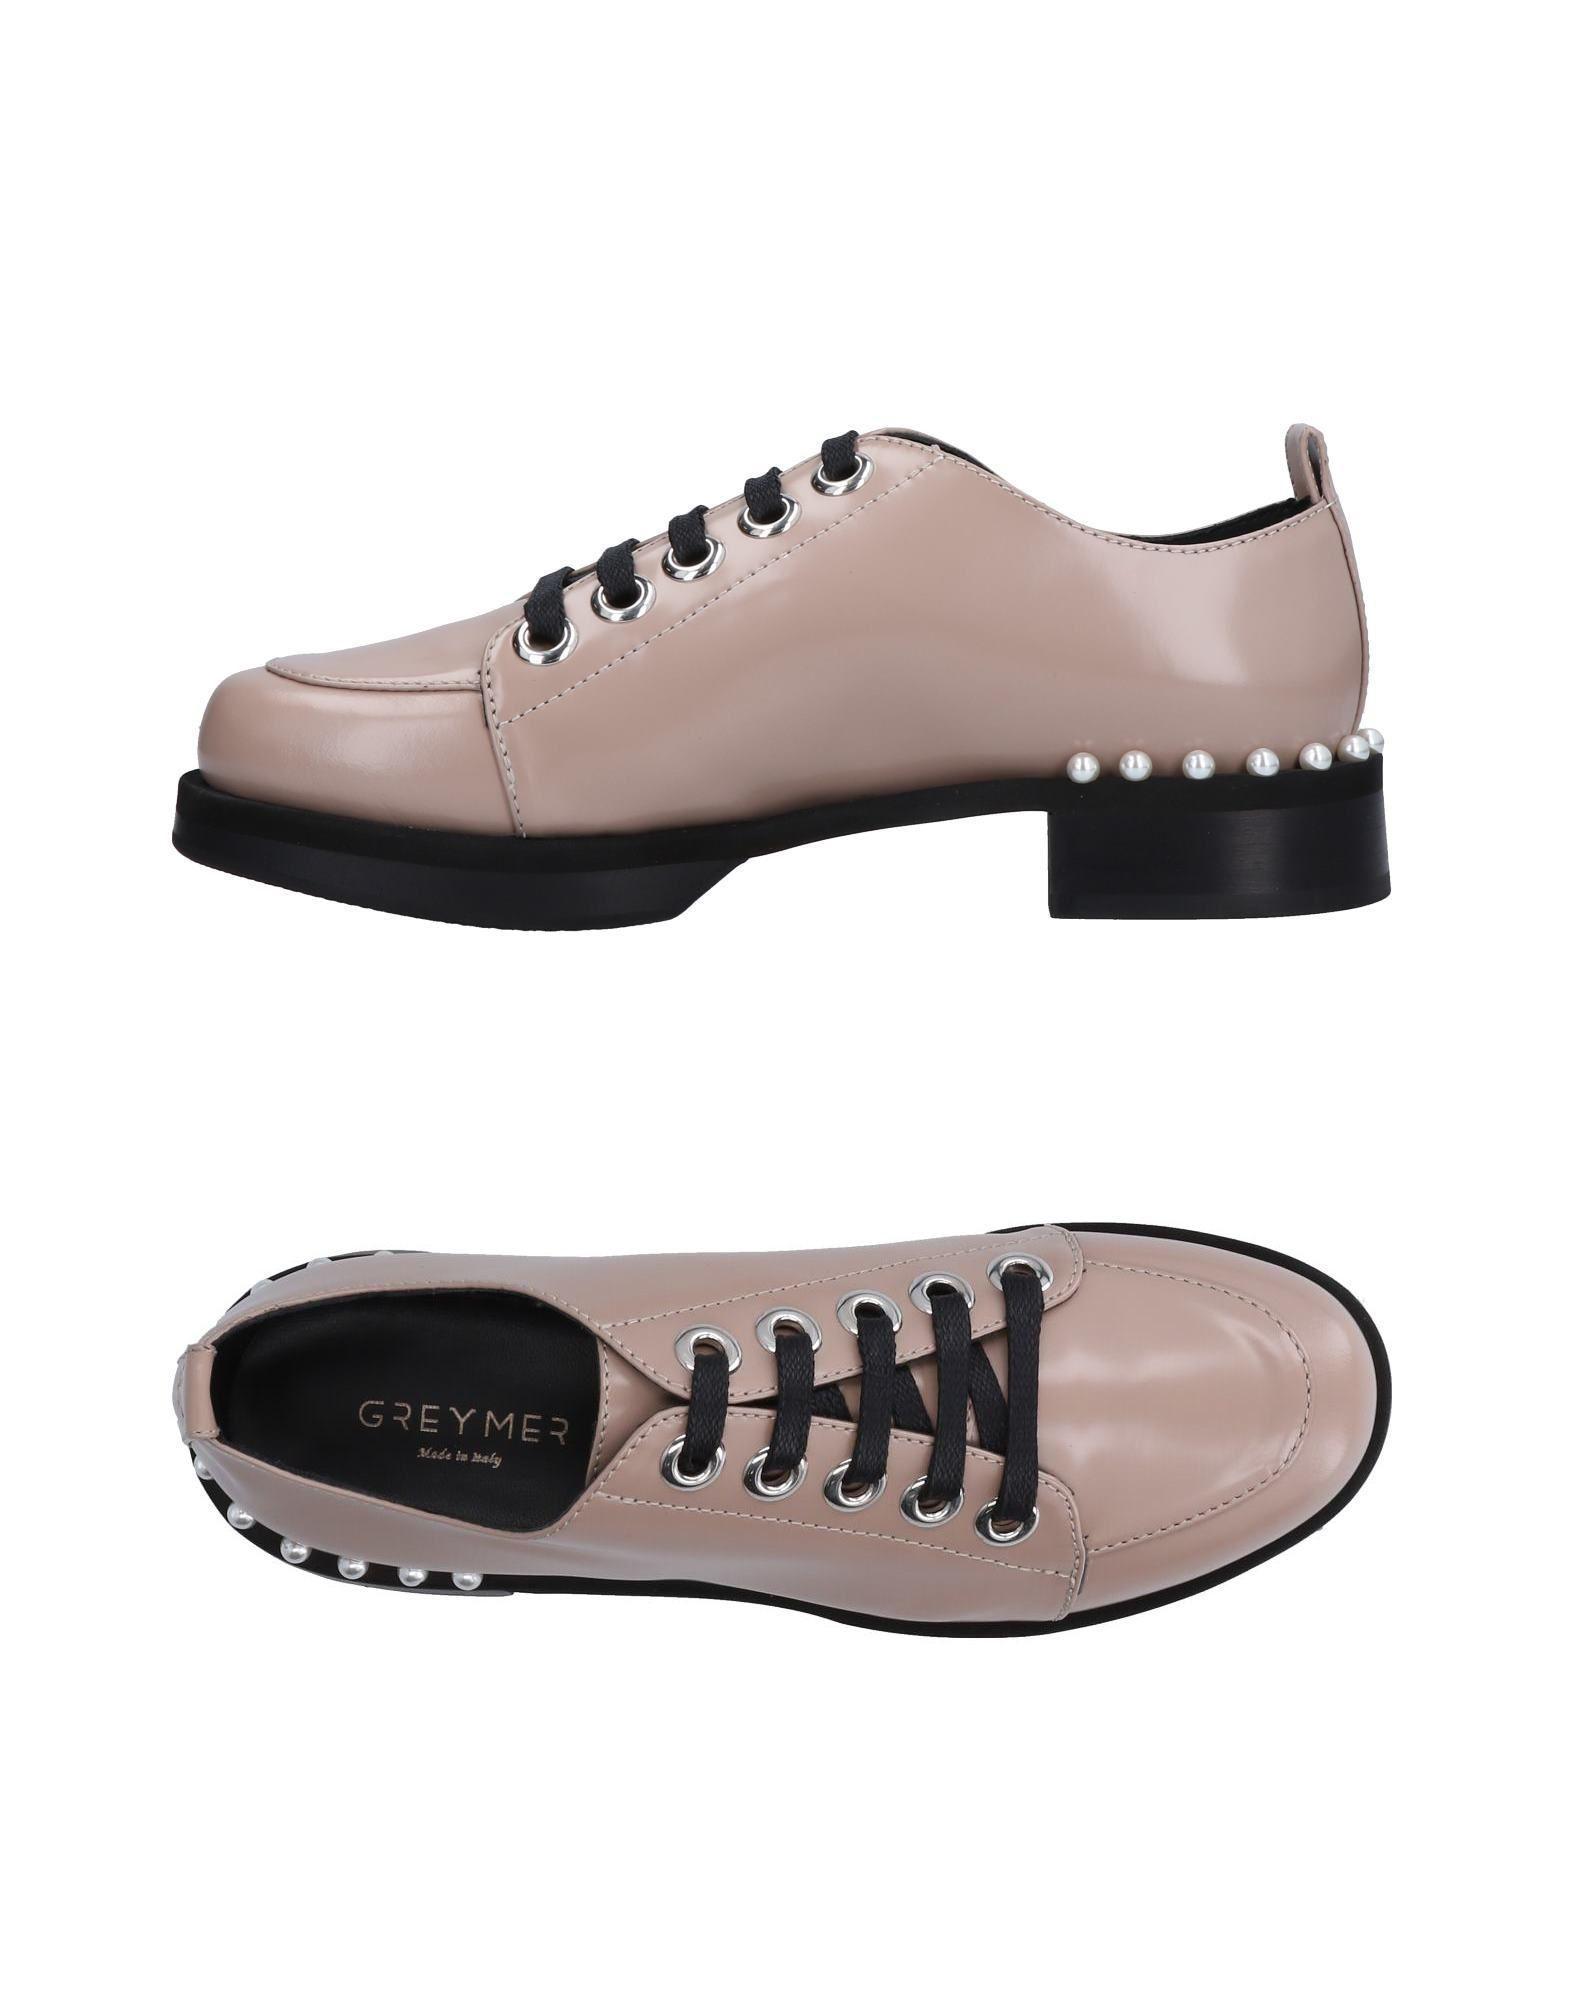 Chaussures - Bas-tops Et Baskets Greymer rnkpqGSb